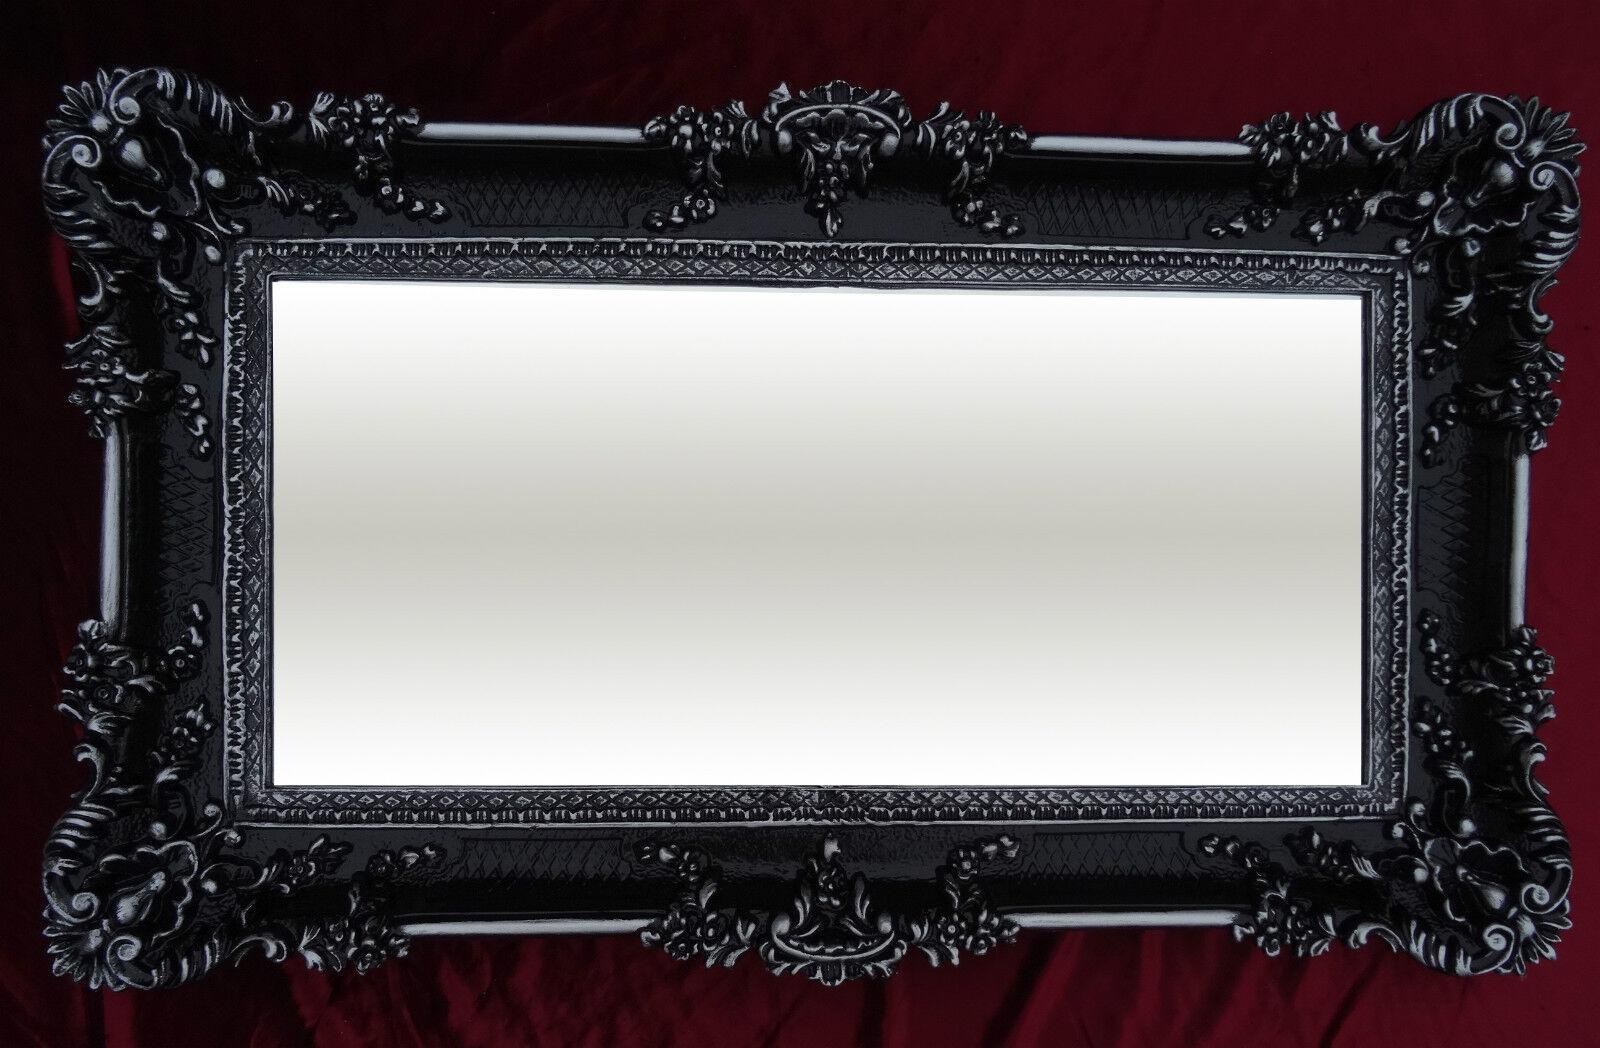 wandspiegel rechteckig schwarz silber dual barock wanddeko antik spiegel 96x57c ebay. Black Bedroom Furniture Sets. Home Design Ideas